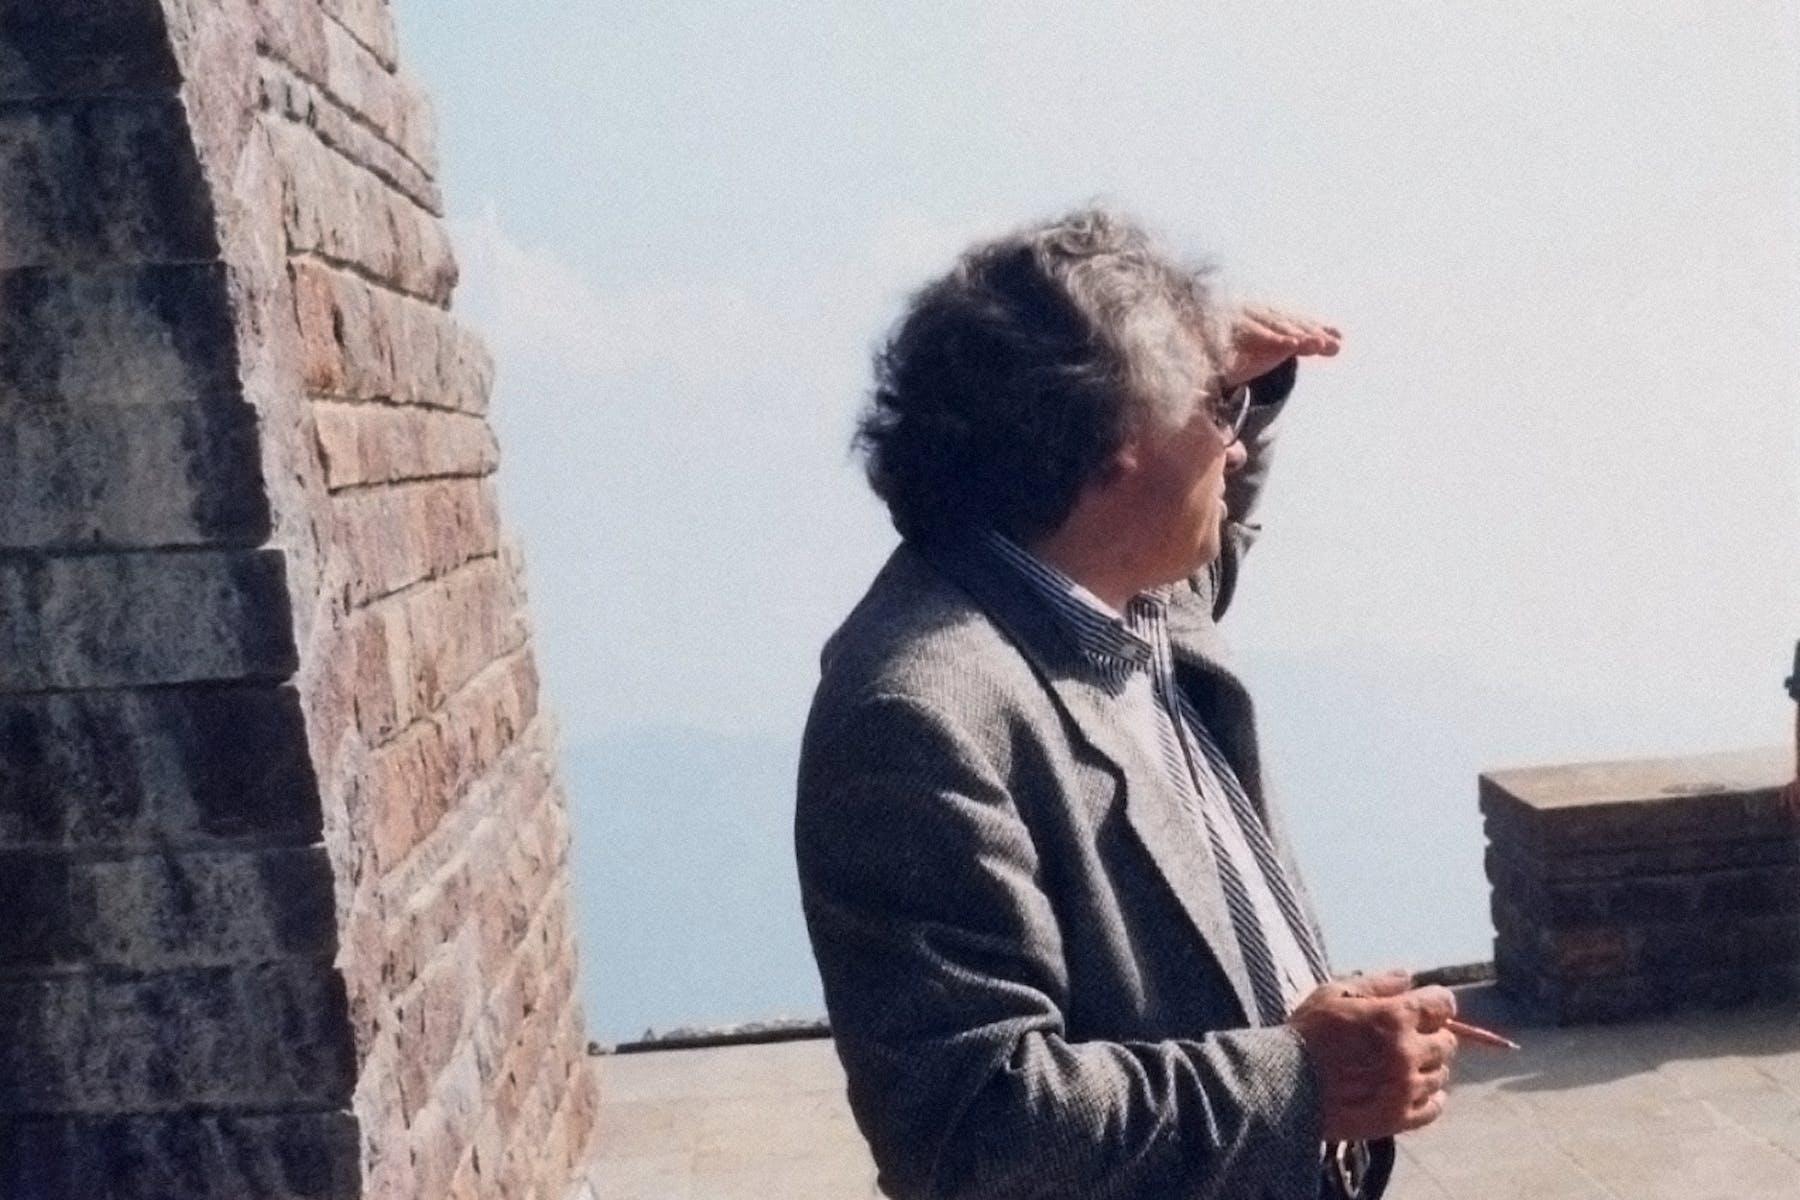 Image 1 de Tamaro. Pietre e angeli. Mario Botta Enzo Cucchi